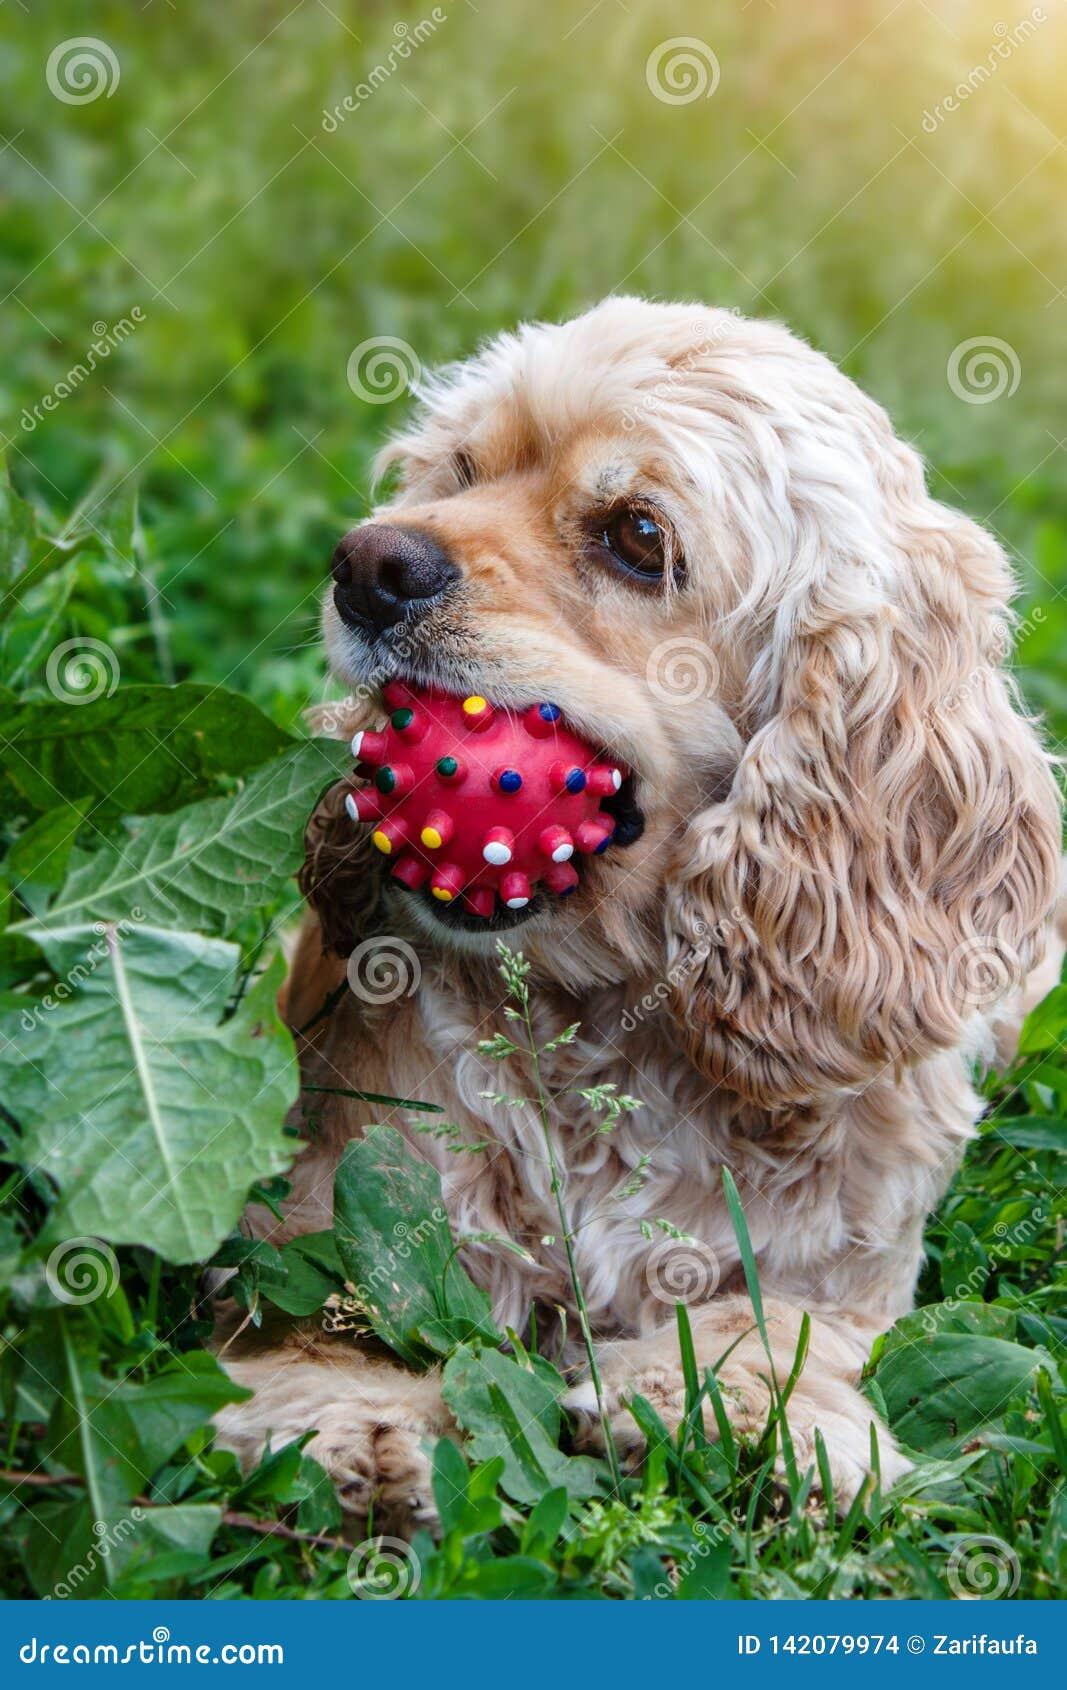 Spaniel кокерспаниеля сидит на траве с шариком во рте Собака играя с шариком